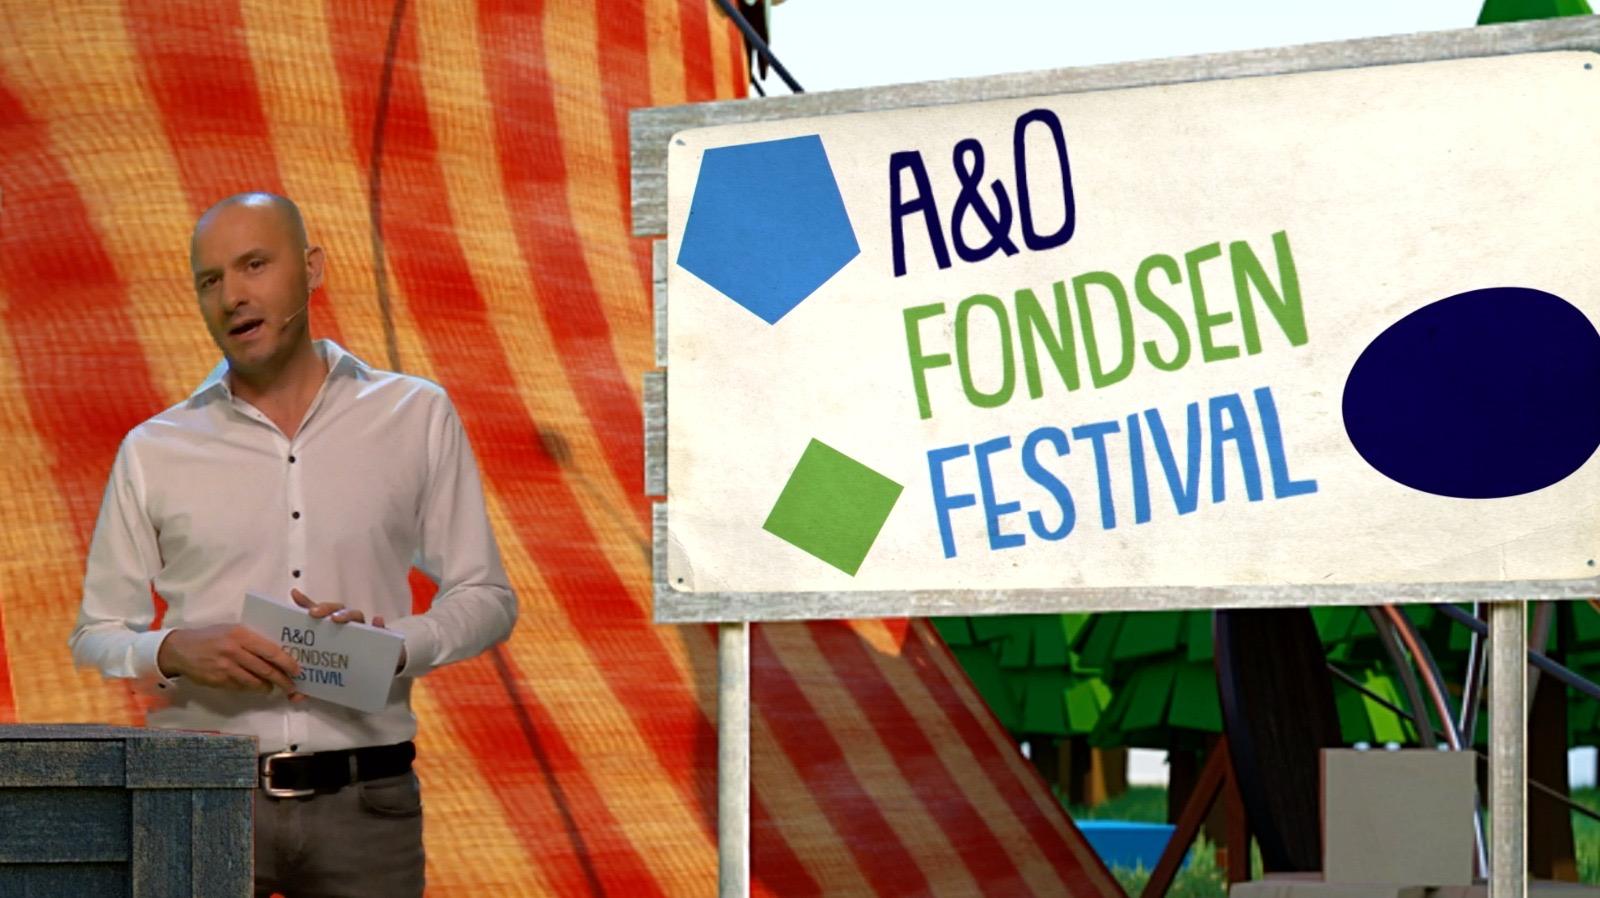 A&OFondsenFestival